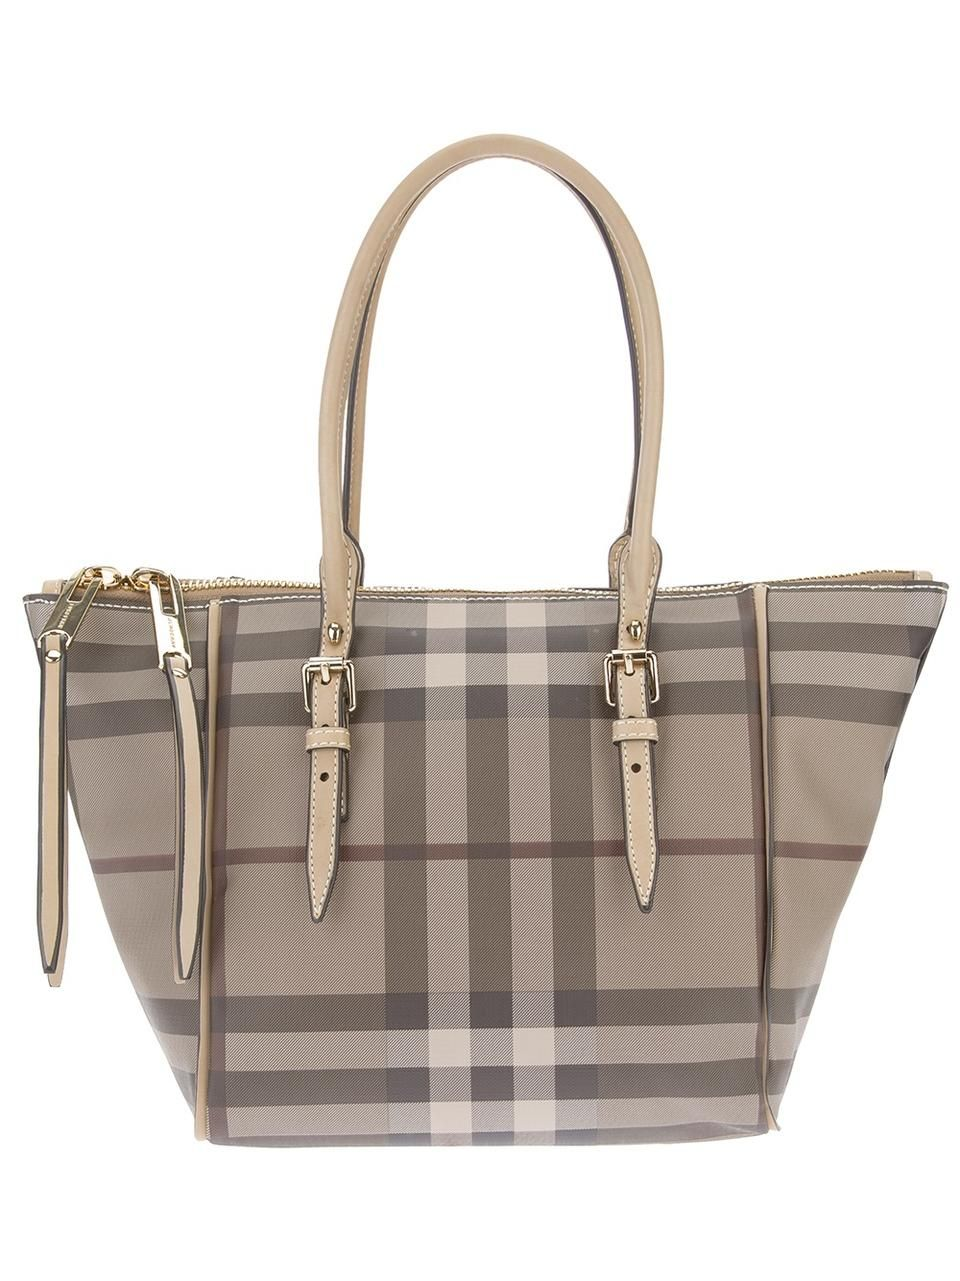 Burberry London Salisbury Tote Beautiful Handbags Fall Winter Fashion